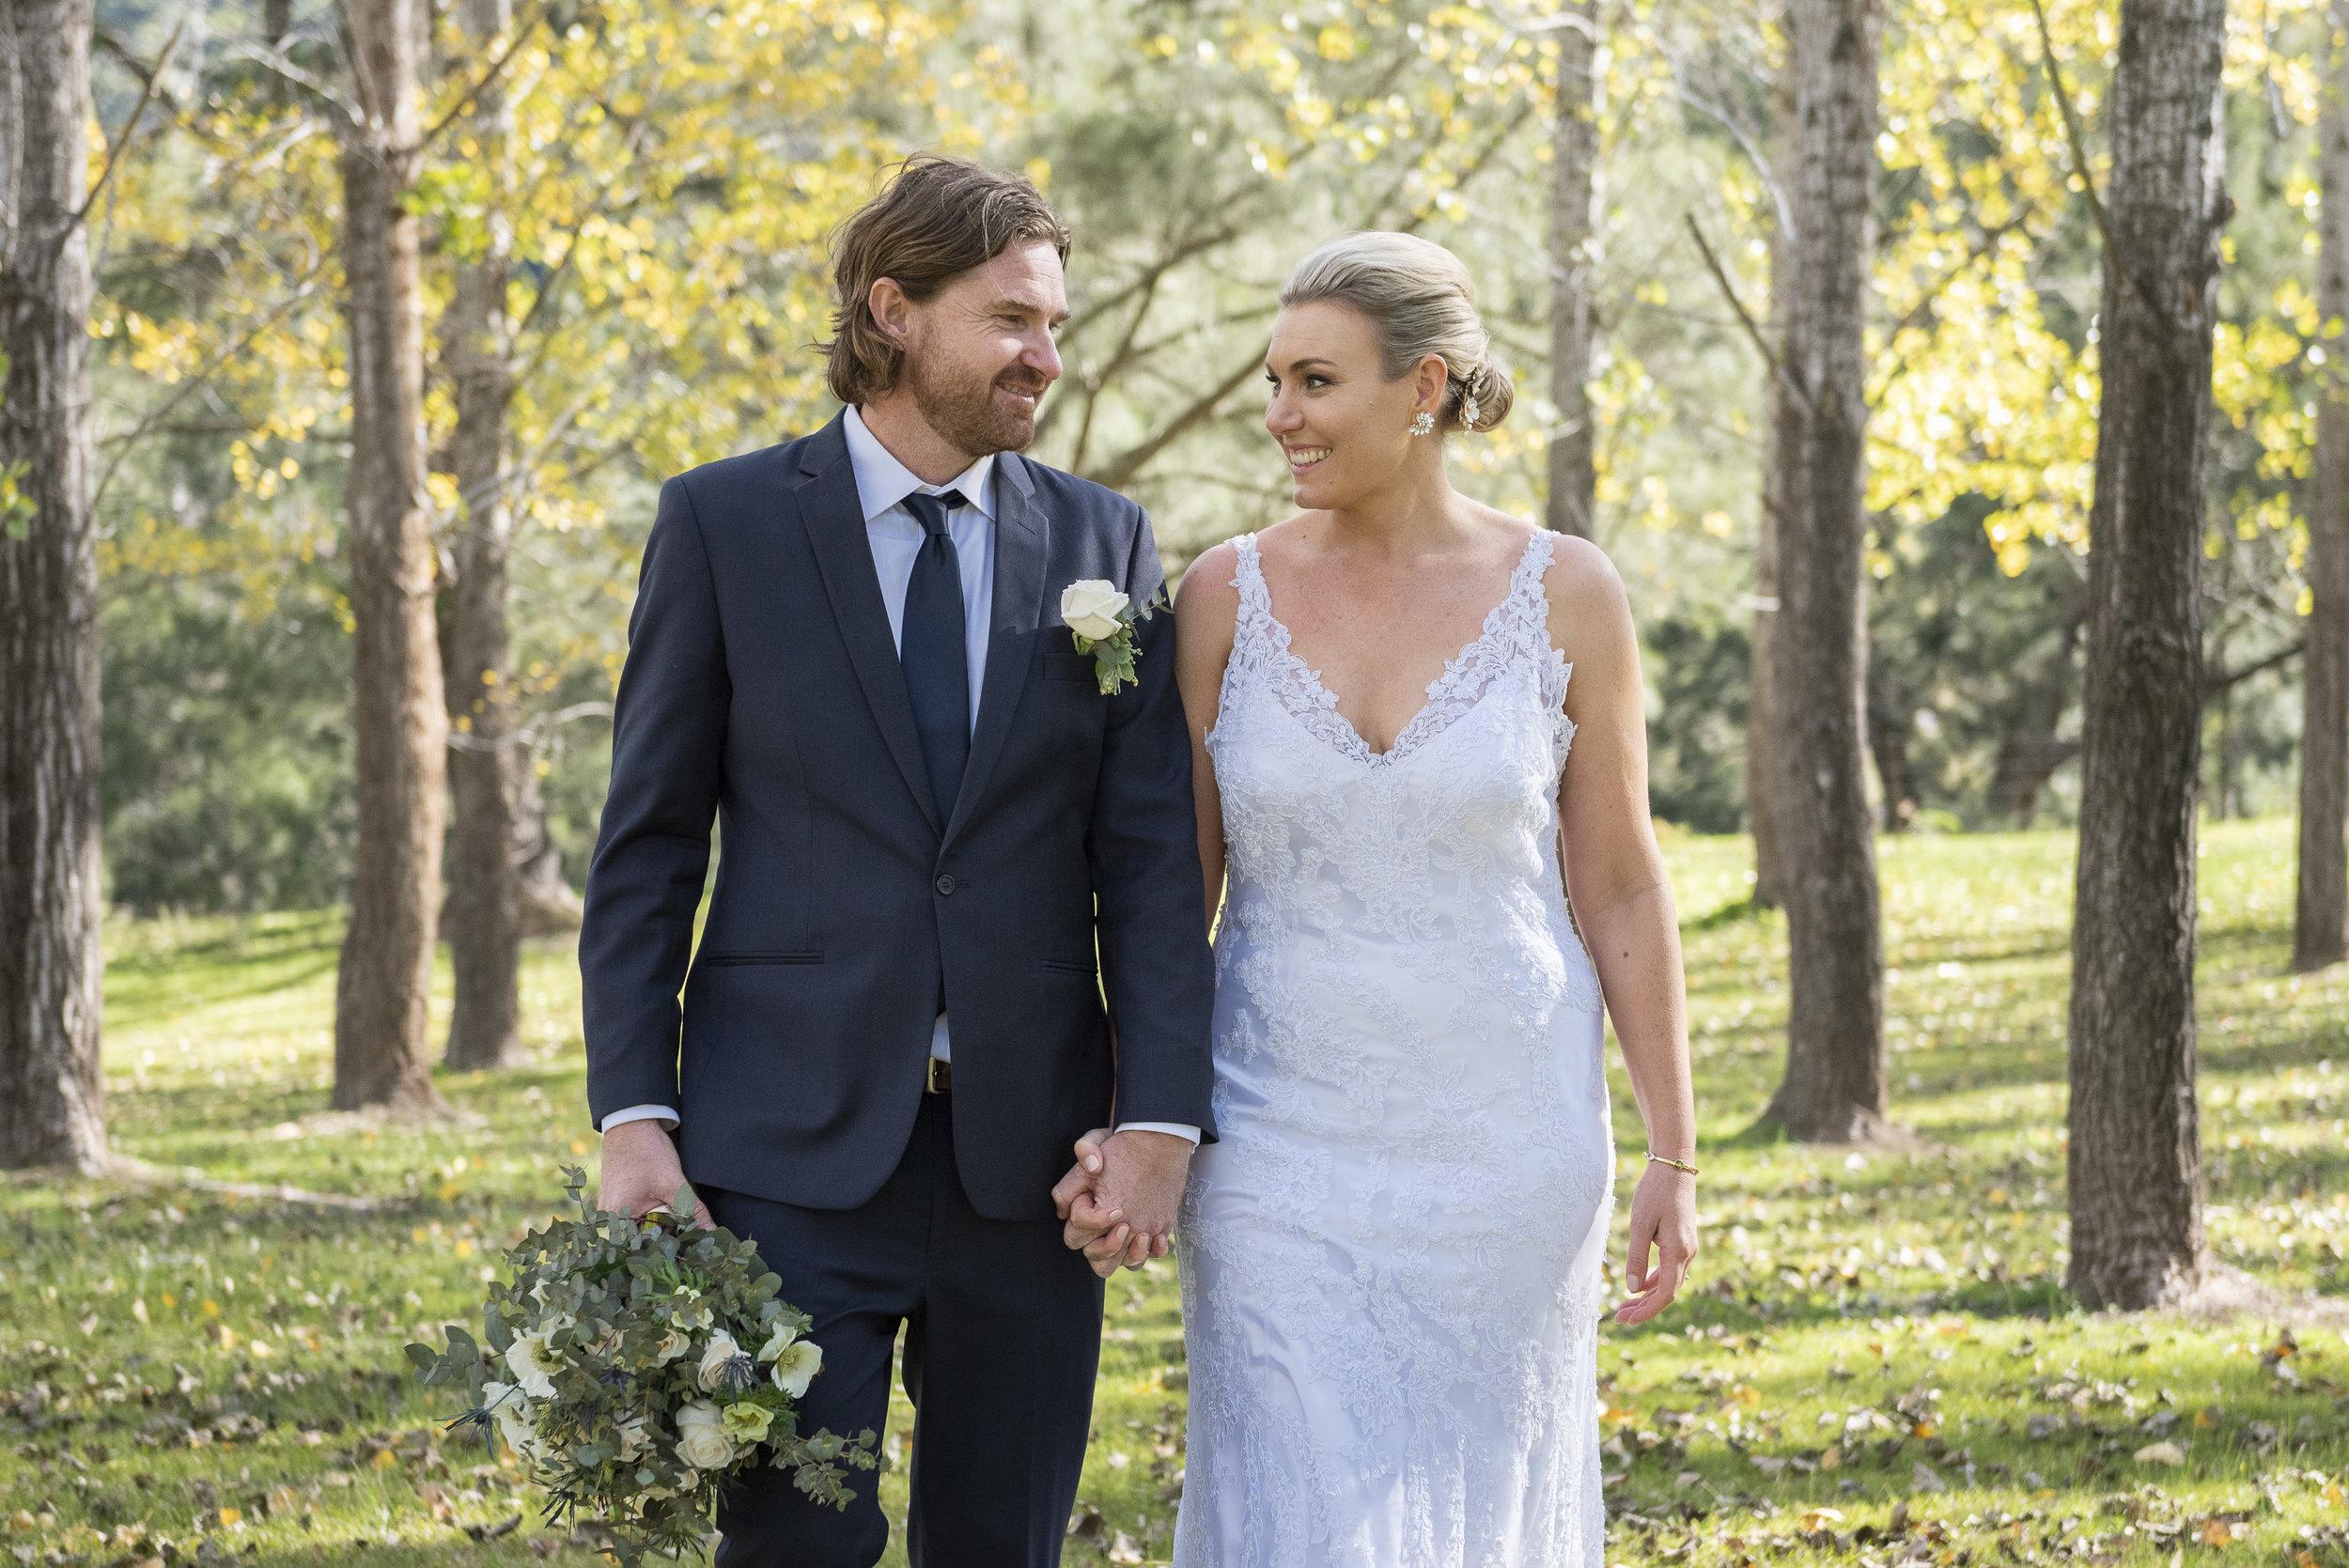 weddings by atelier photography-wedding-17.jpg